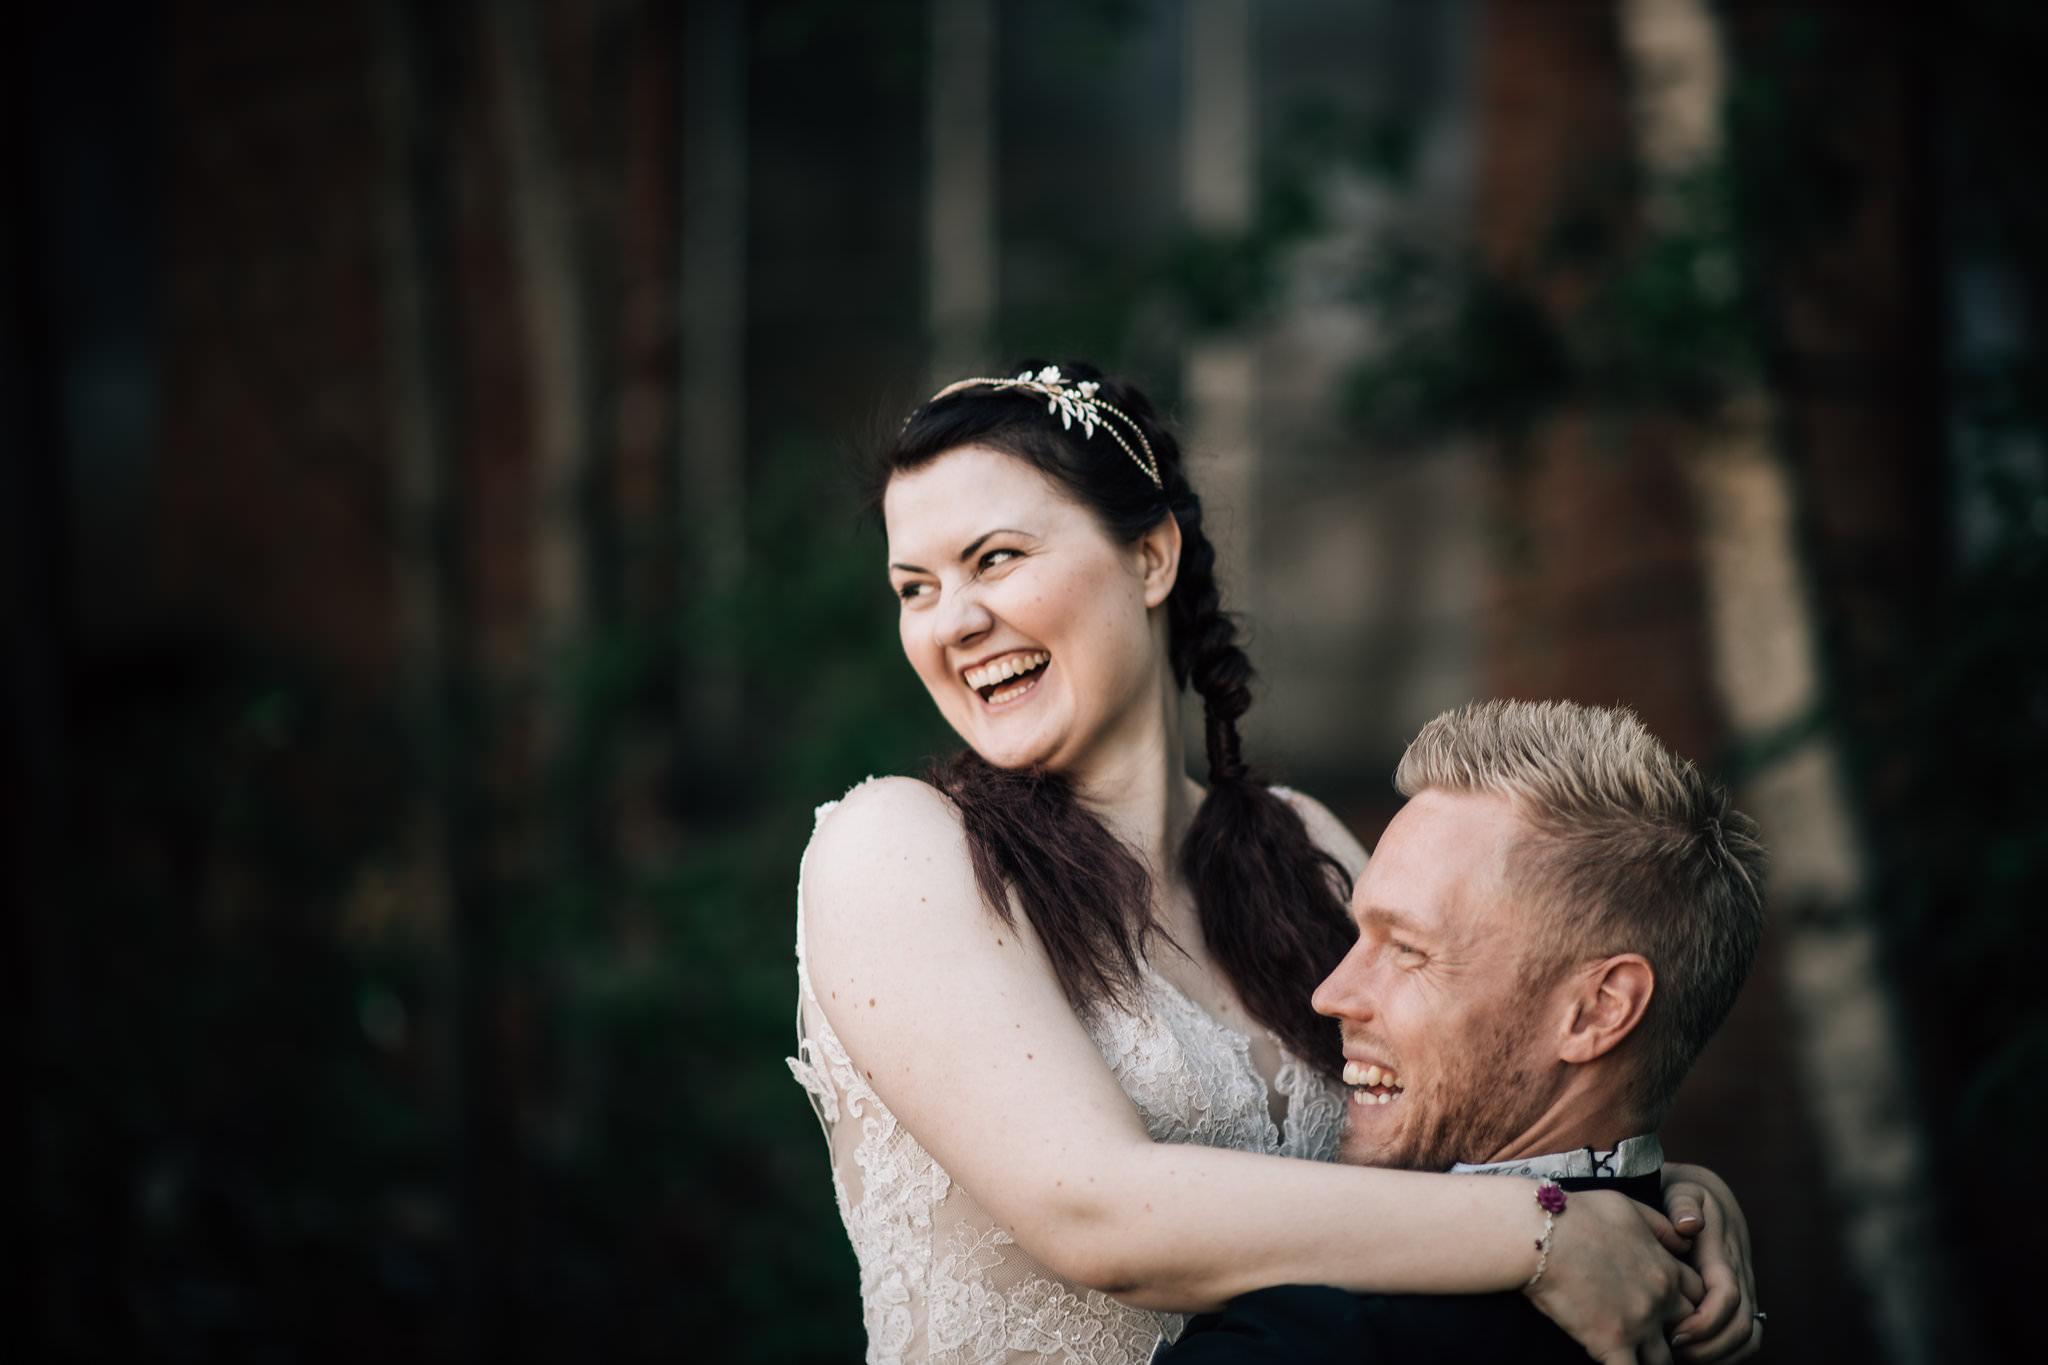 _N850008-fotograf-vestfold-bryllupsfotograf-.jpg